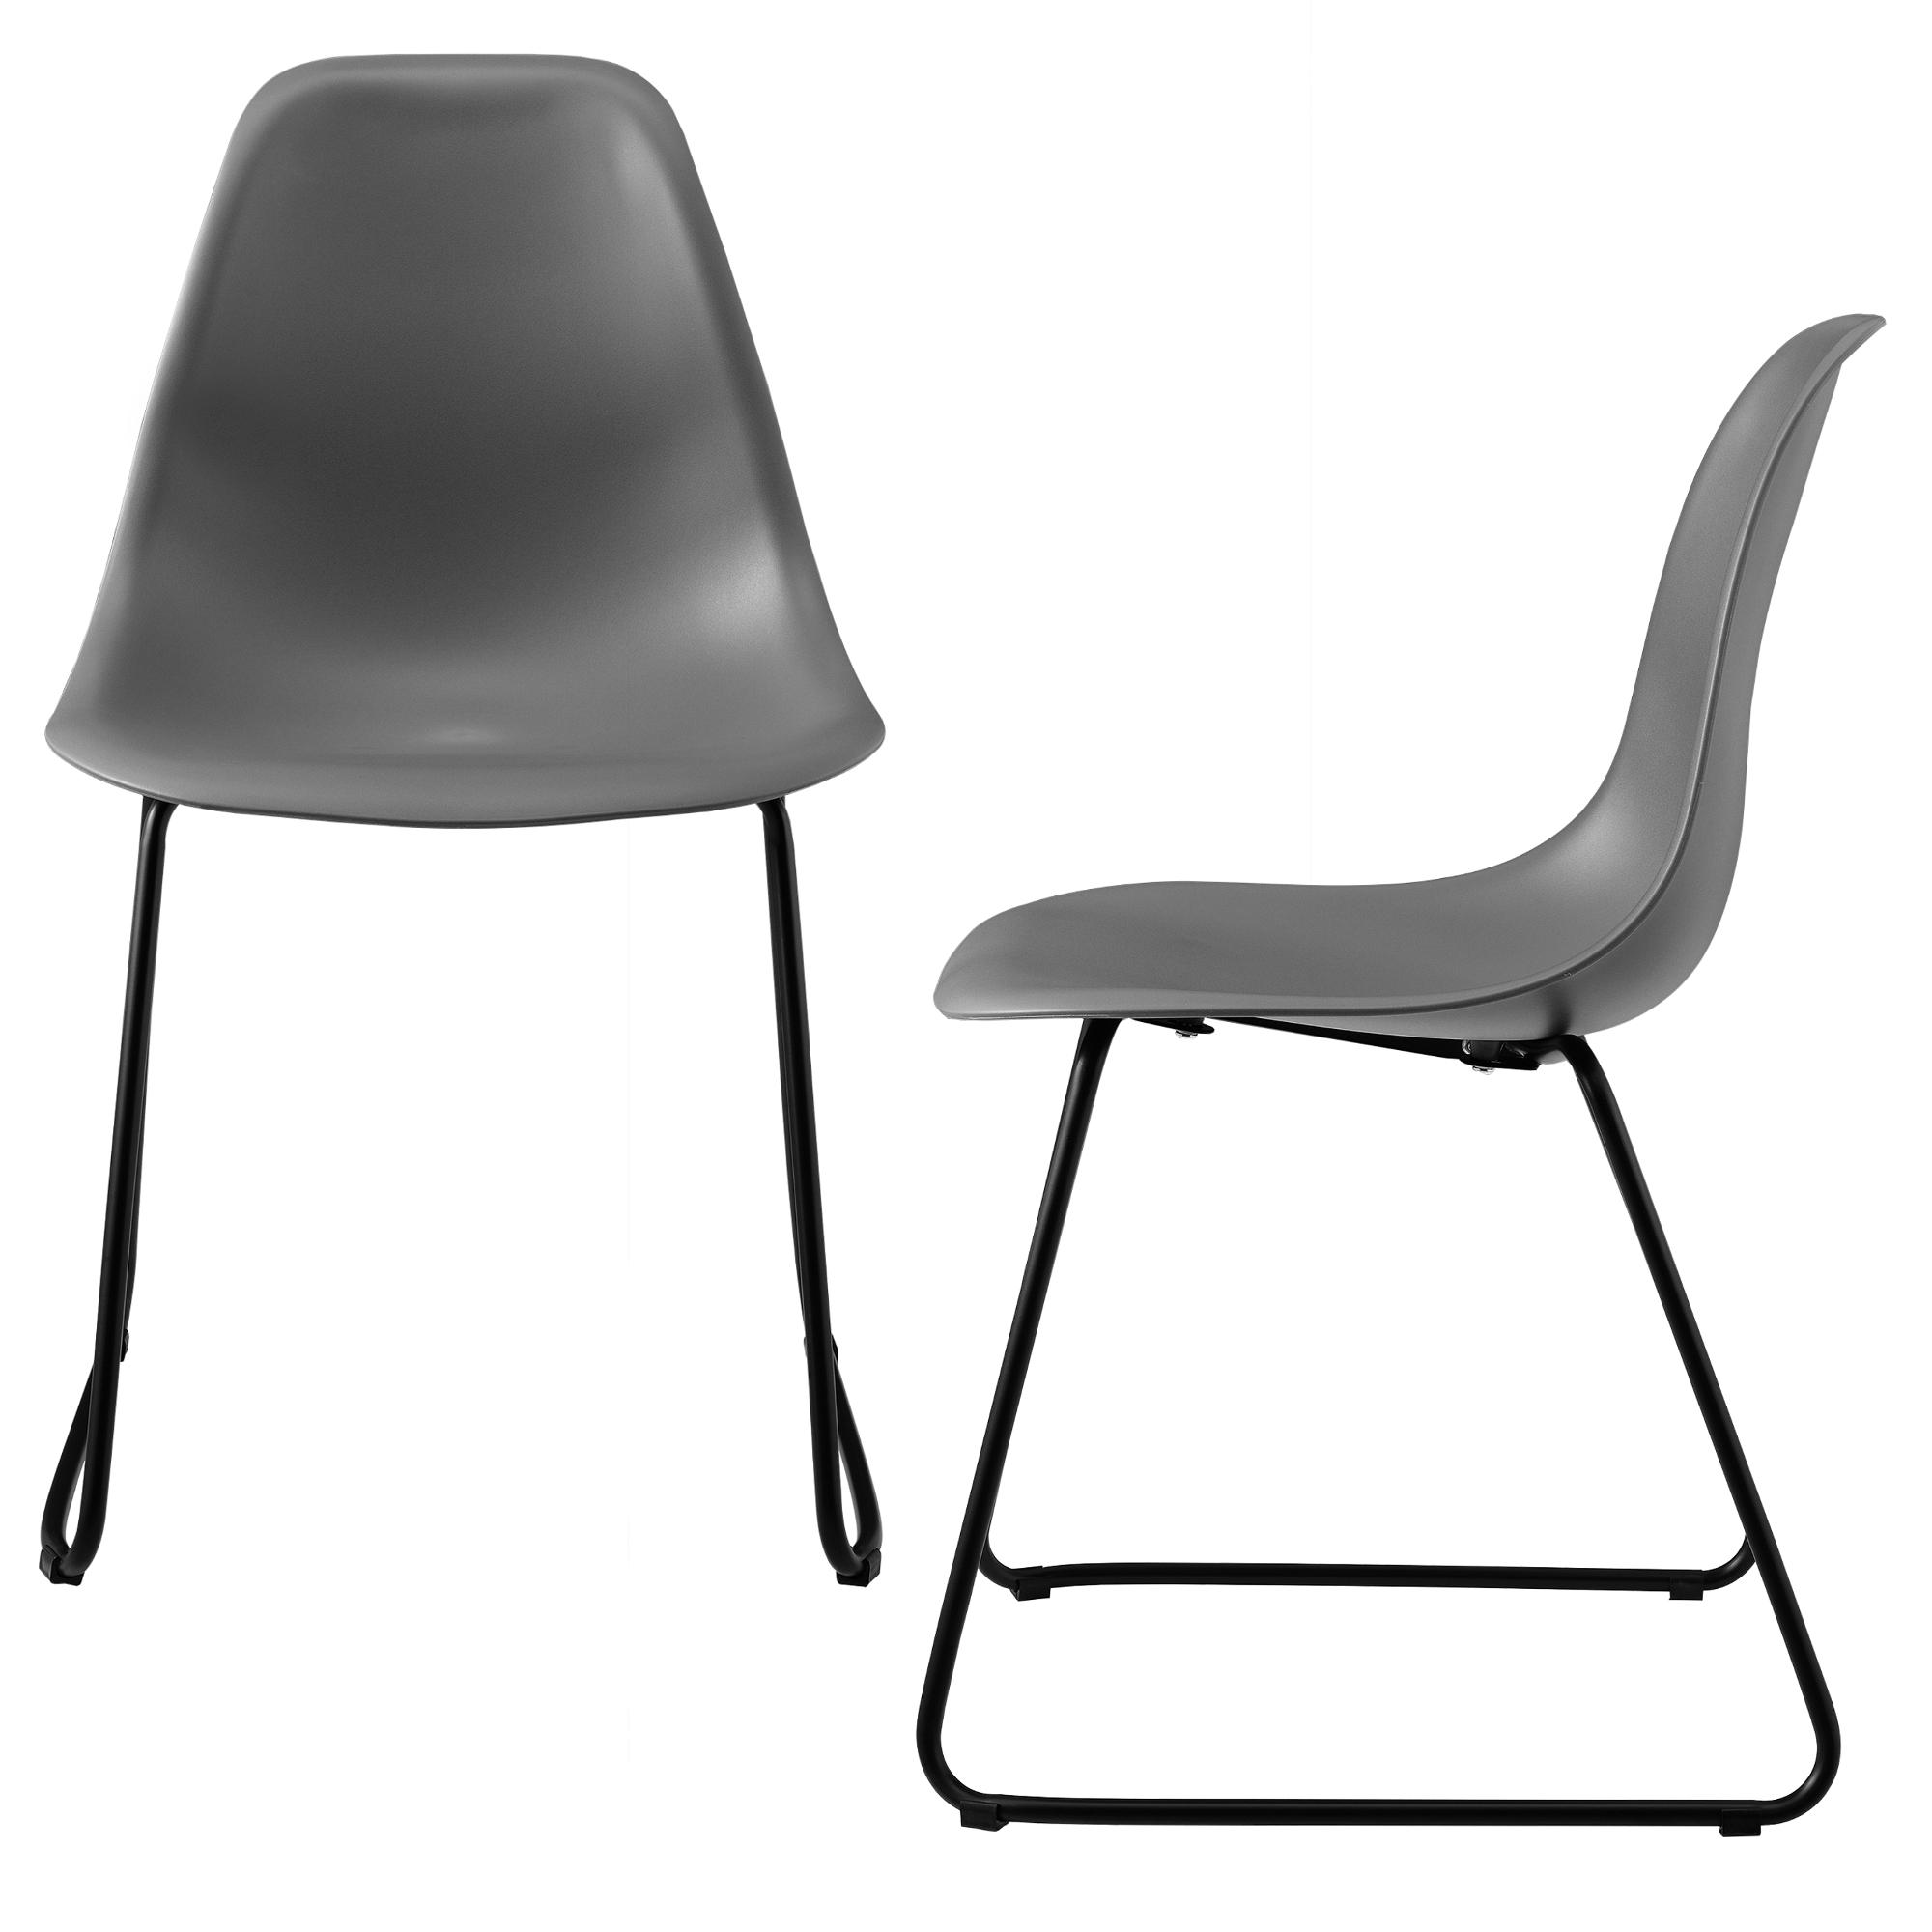 ® 2x Barhocker 110x46,5cm Design Barstuhl Bar Theken Hocker Set Metall en.casa